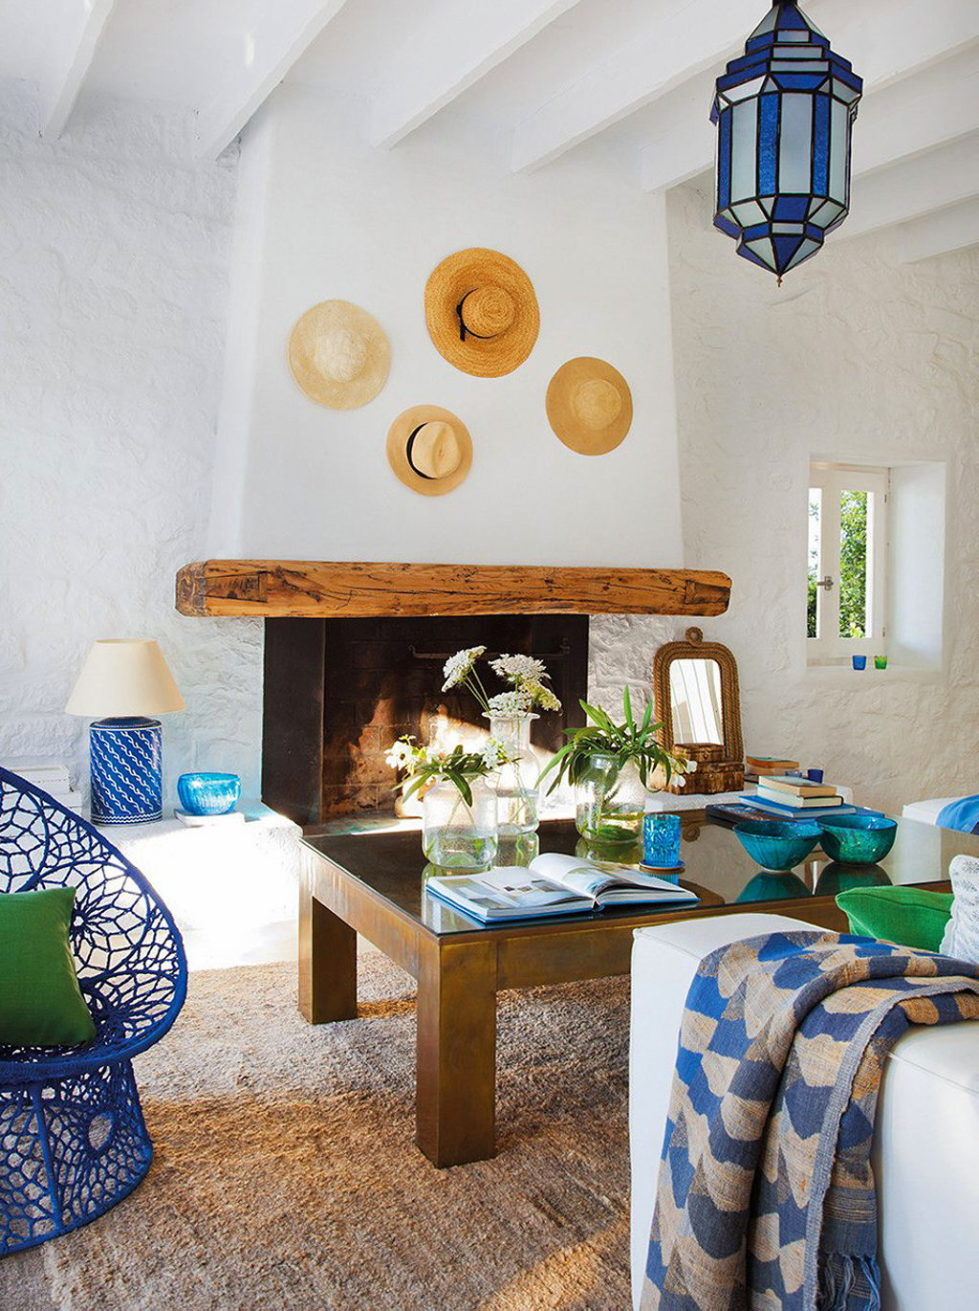 The House Of Mediterranean Style, Ibitza 5